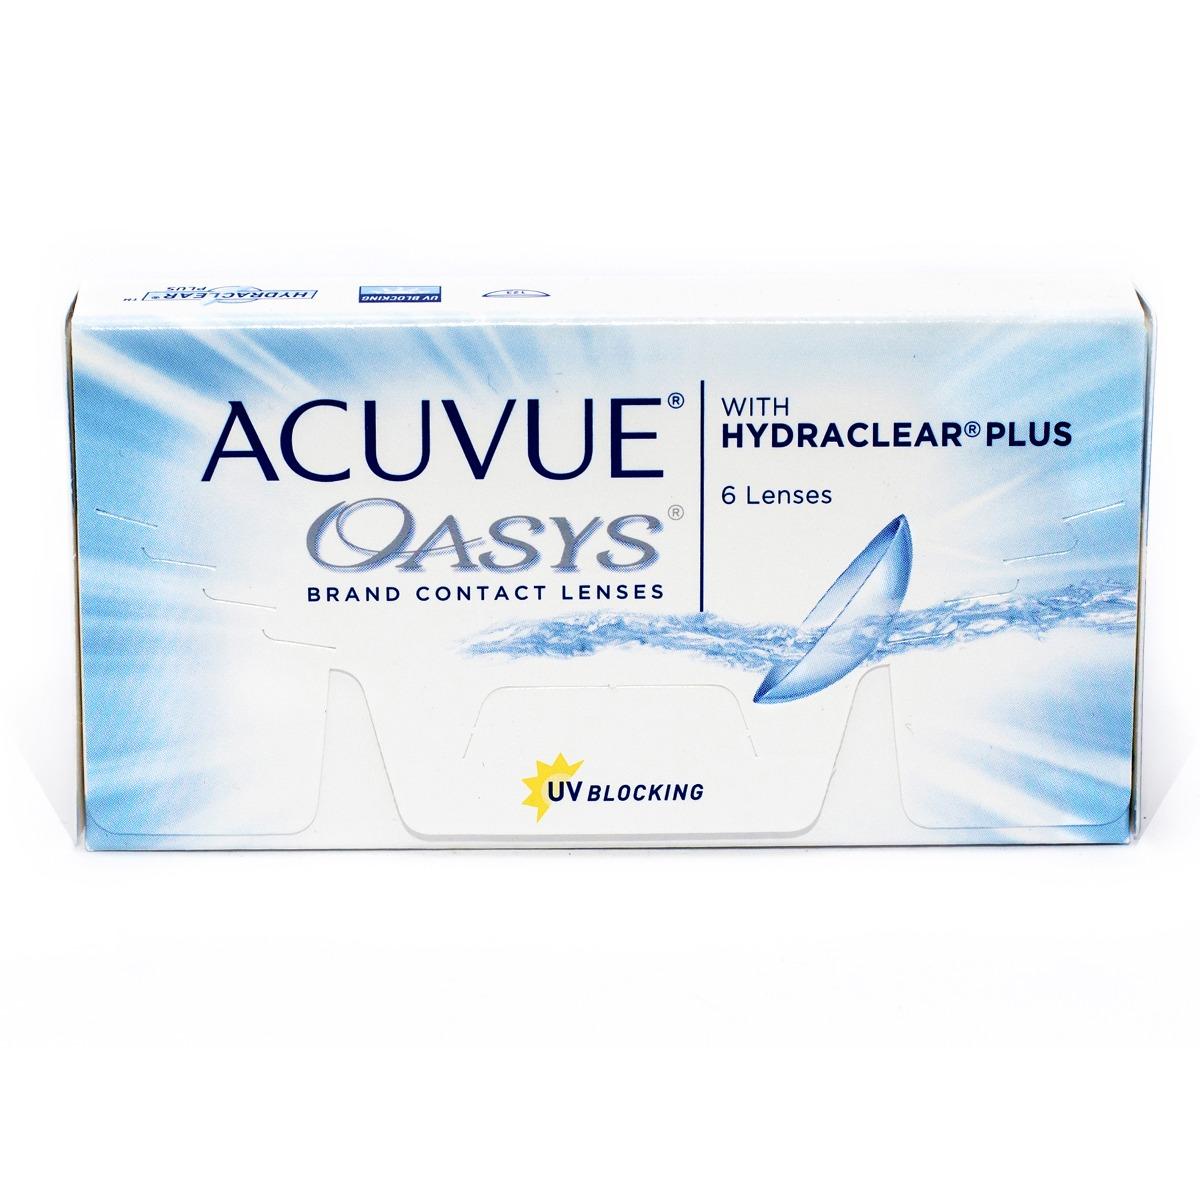 bd21bb434c297 Lentes De Contato Acuvue Oasys Com Hydraclear Plus Grau-4.75 - R ...